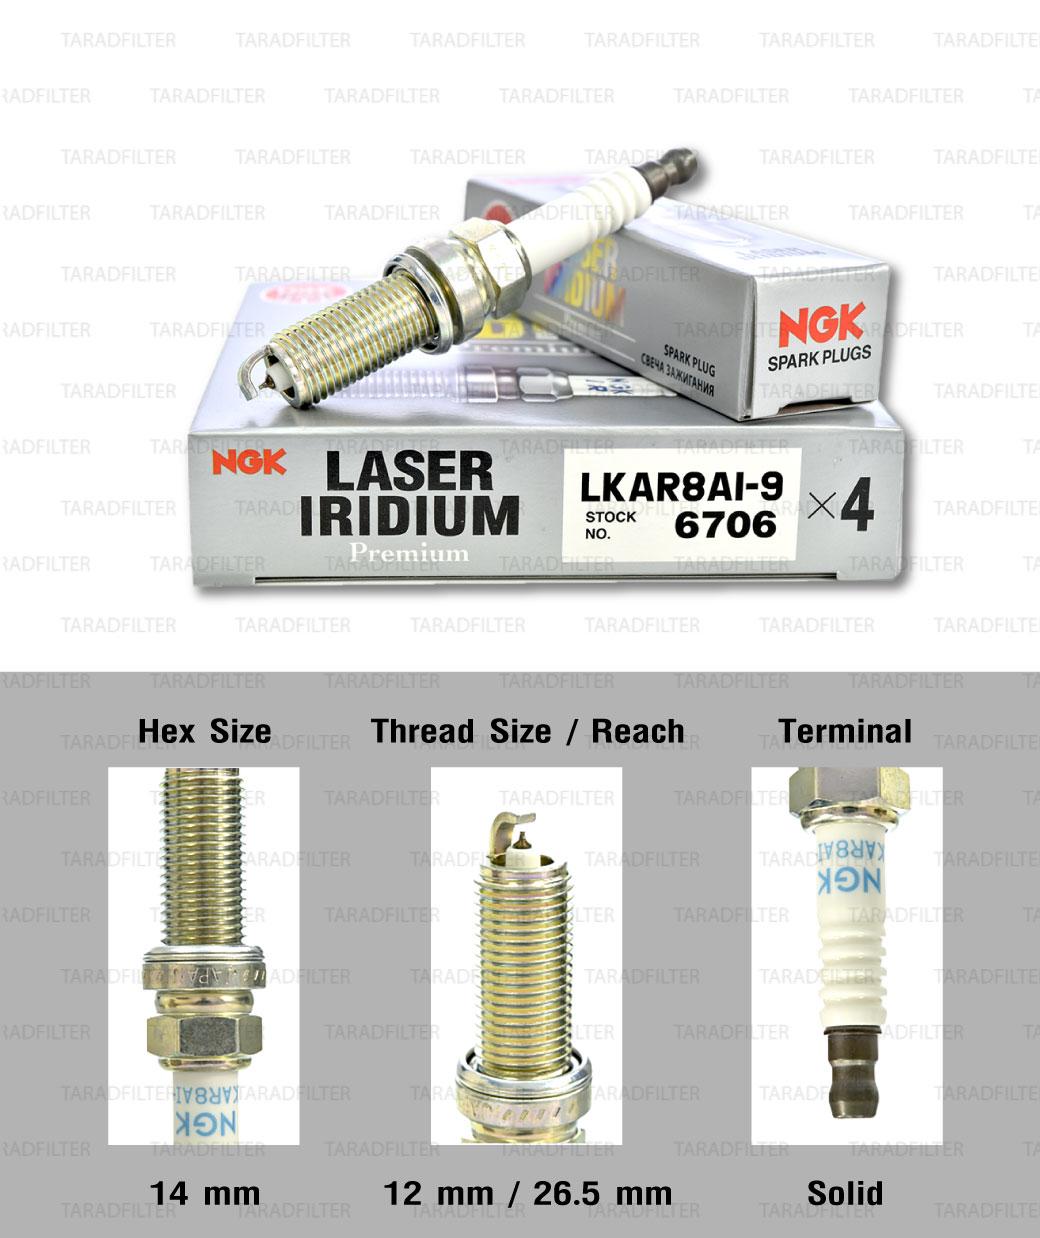 NGK หัวเทียน Laser Iridium ขั้ว Iridium ติดรถ LKAR8AI-9 ใช้สำหรับมอเตอร์ไซค์ KTM Duke200, RC200, Duke390, Duke690, Enduro690 (1 หัว) - Made in Japan